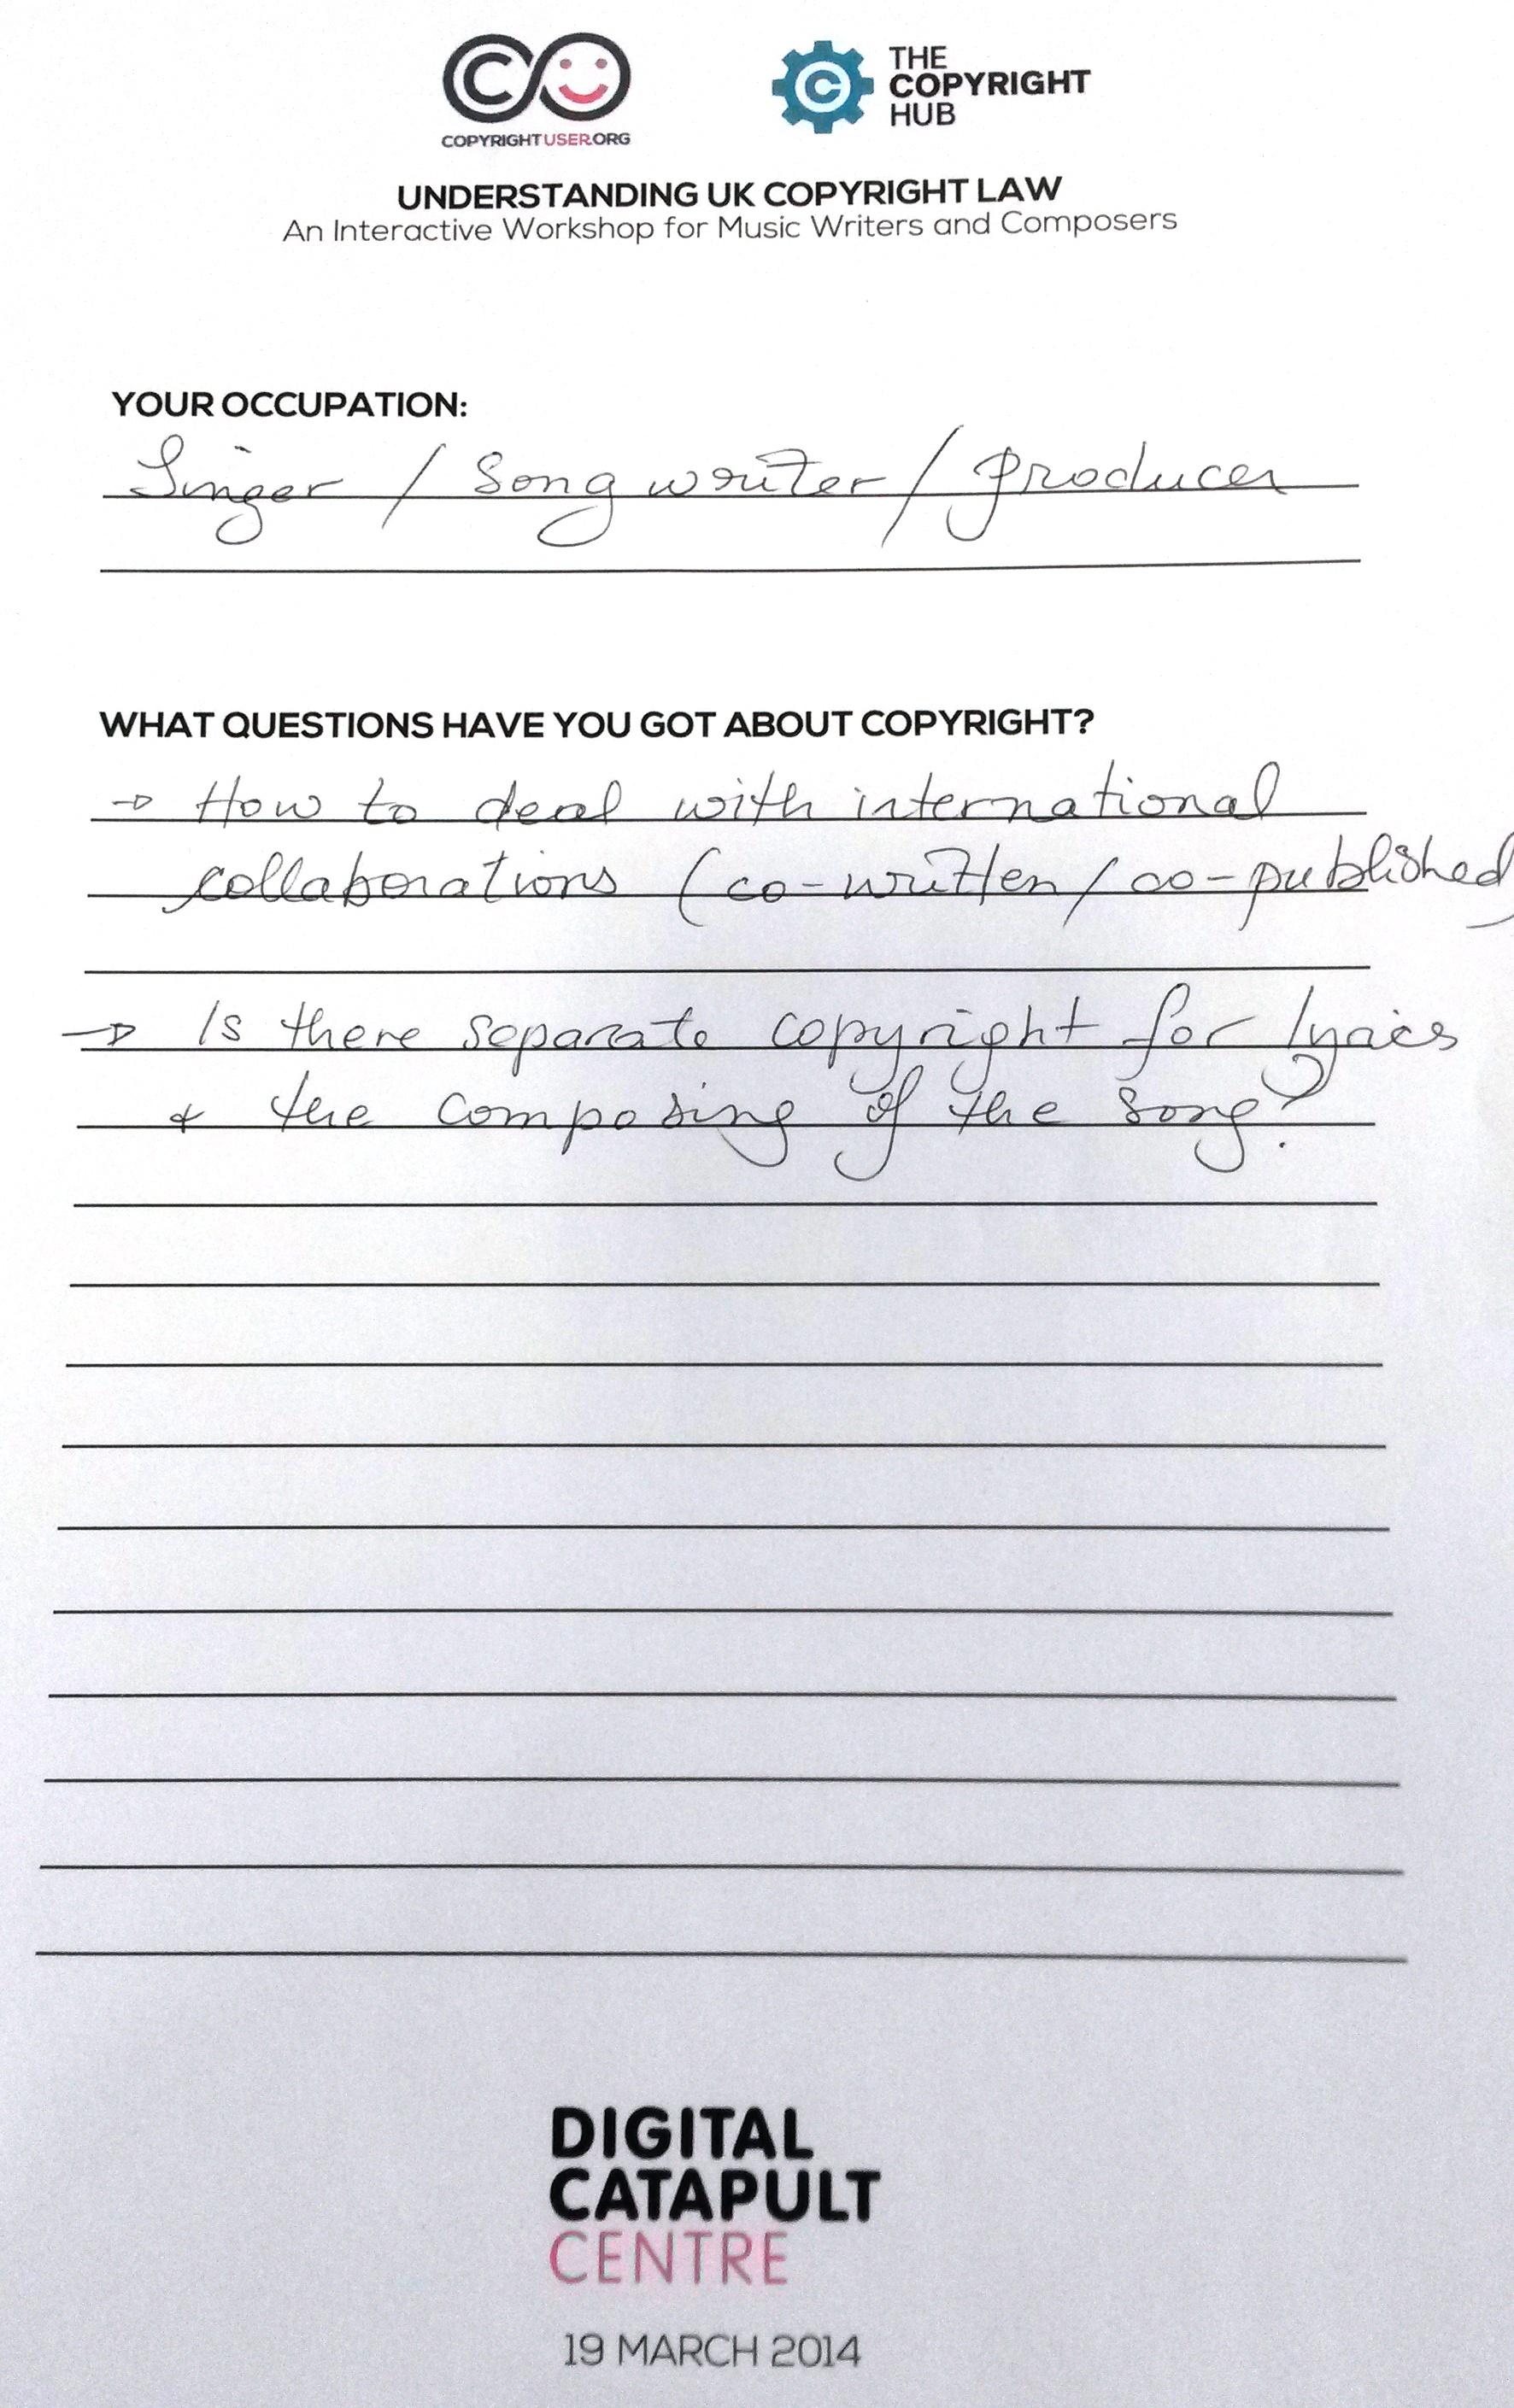 copyright user form